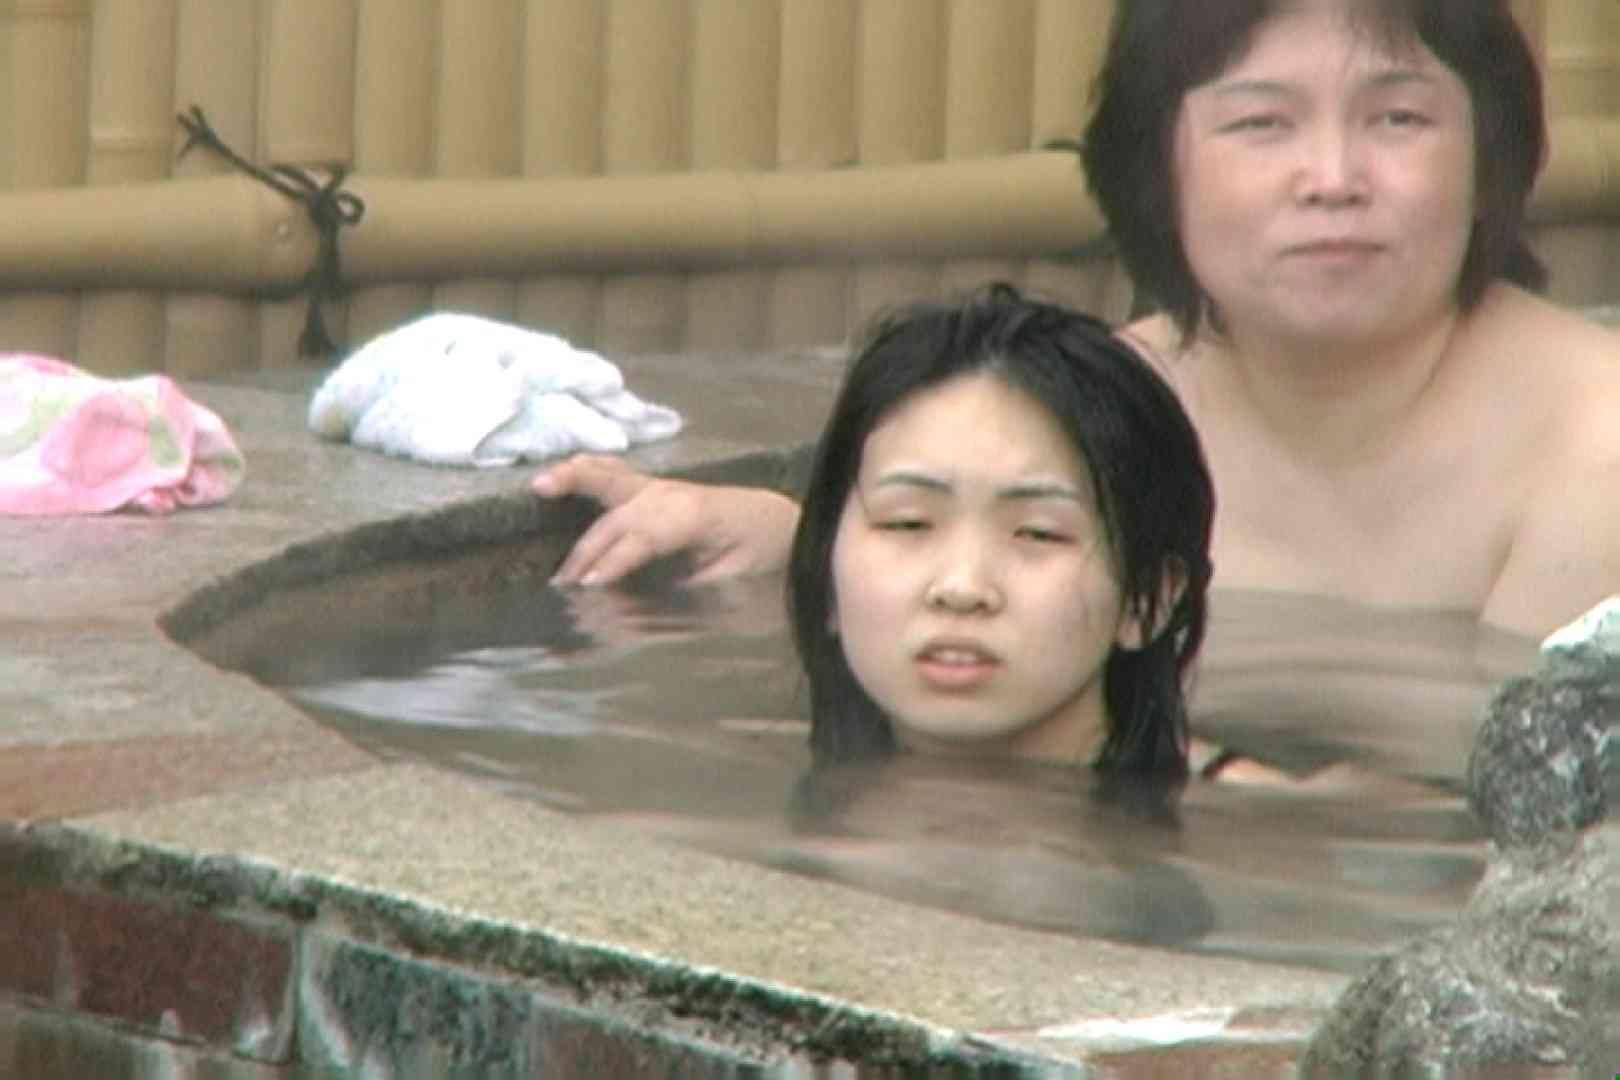 Aquaな露天風呂Vol.646 OLセックス  97画像 30